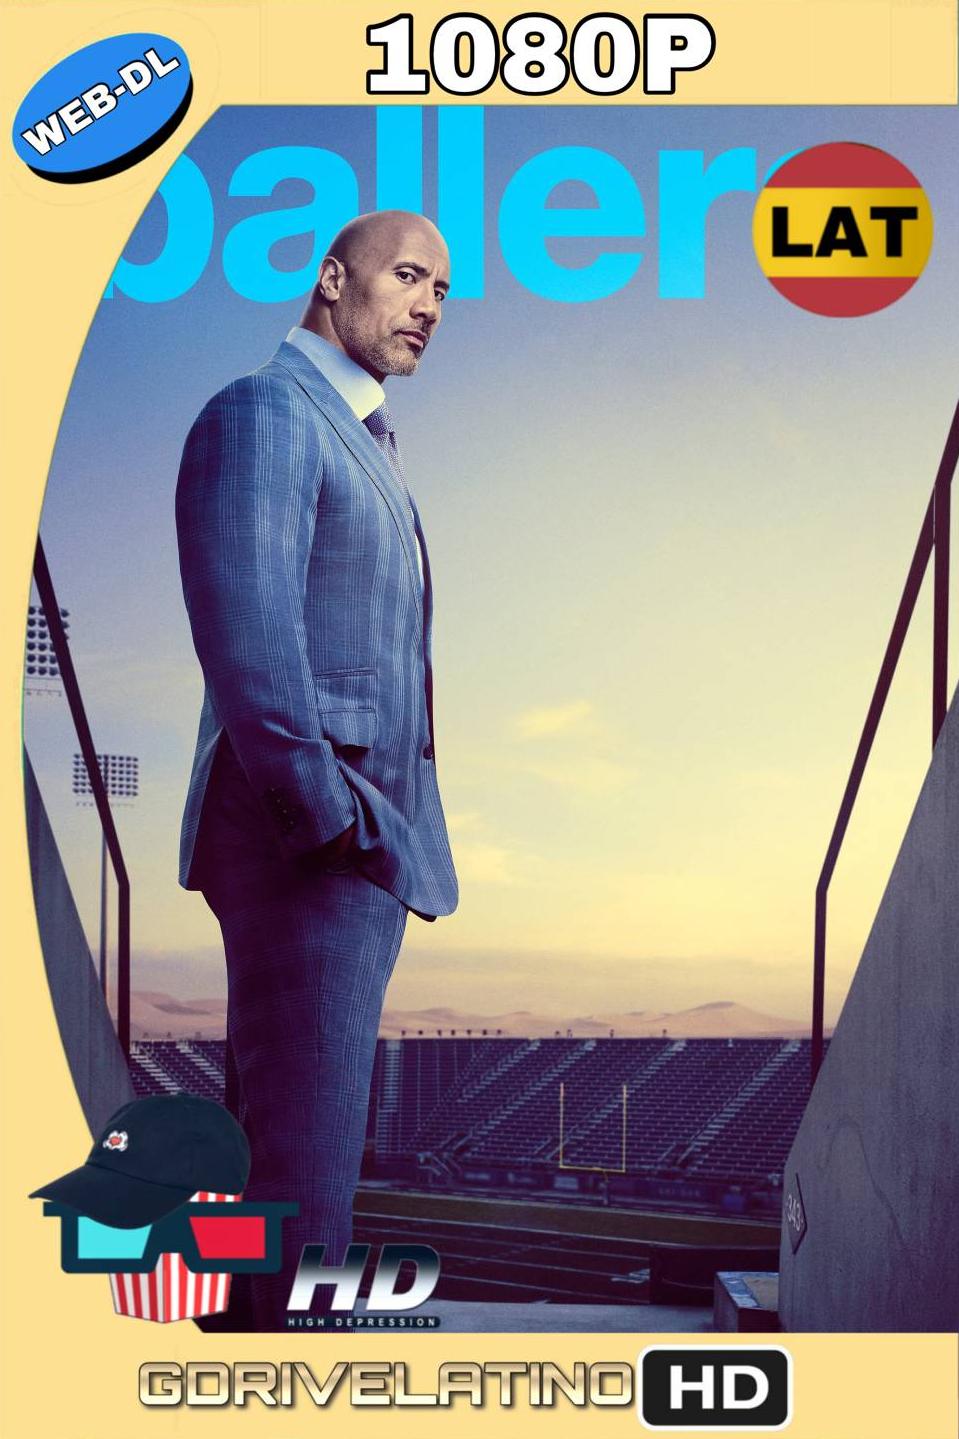 Ballers (2019) Temporada 5 Capitulo 3 AMZN WEB DL 1080 Latino-Ingles MKV